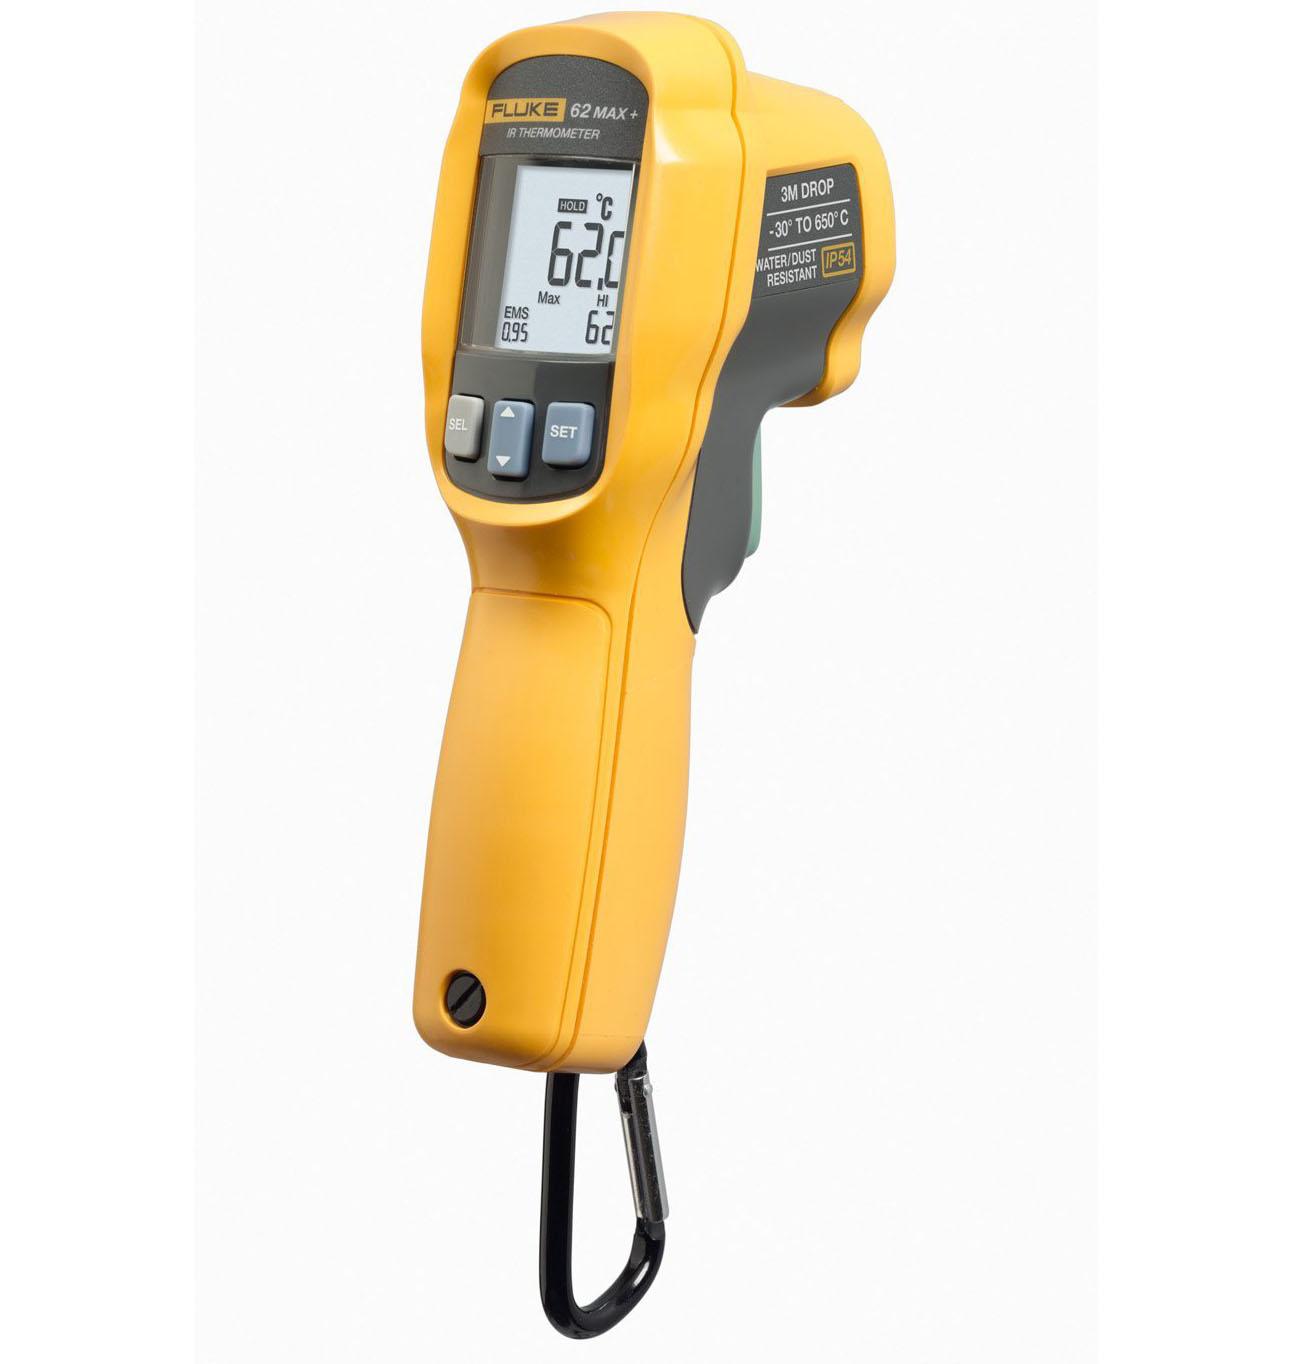 Fluke Infrared Thermometer 62 MAX Plus